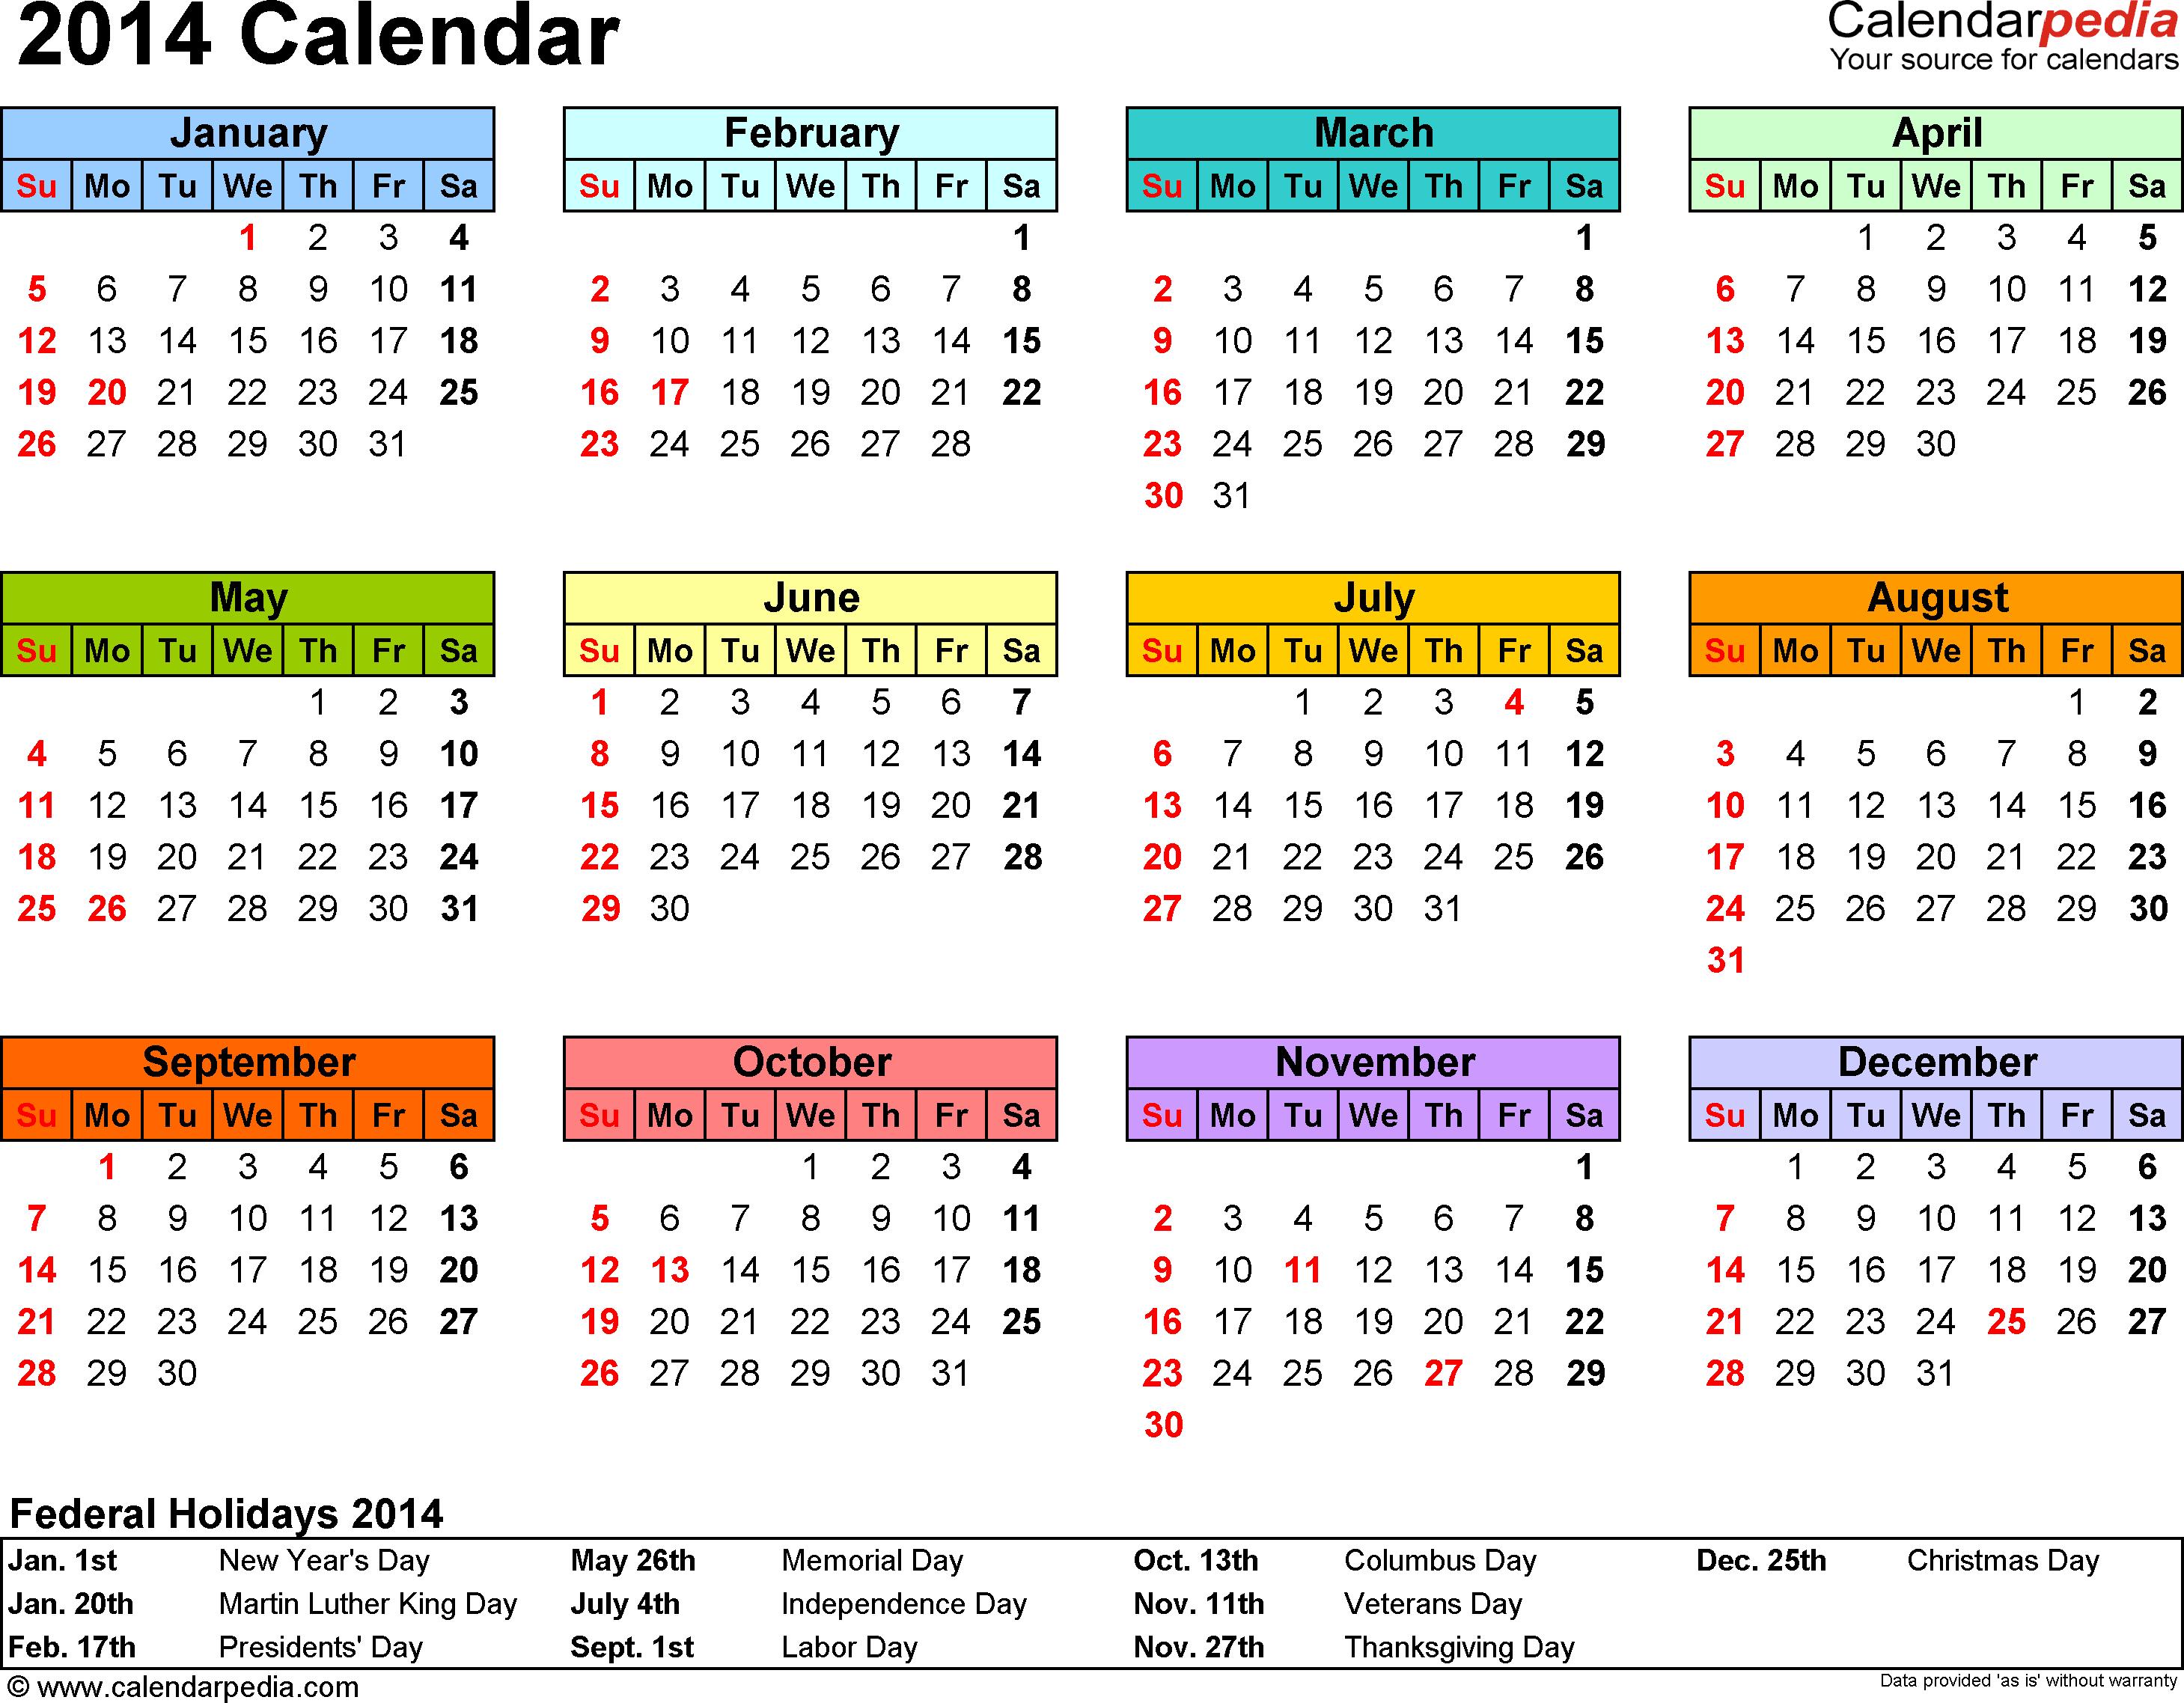 2014 Calendar Excel 13 free printable templates (.xls)